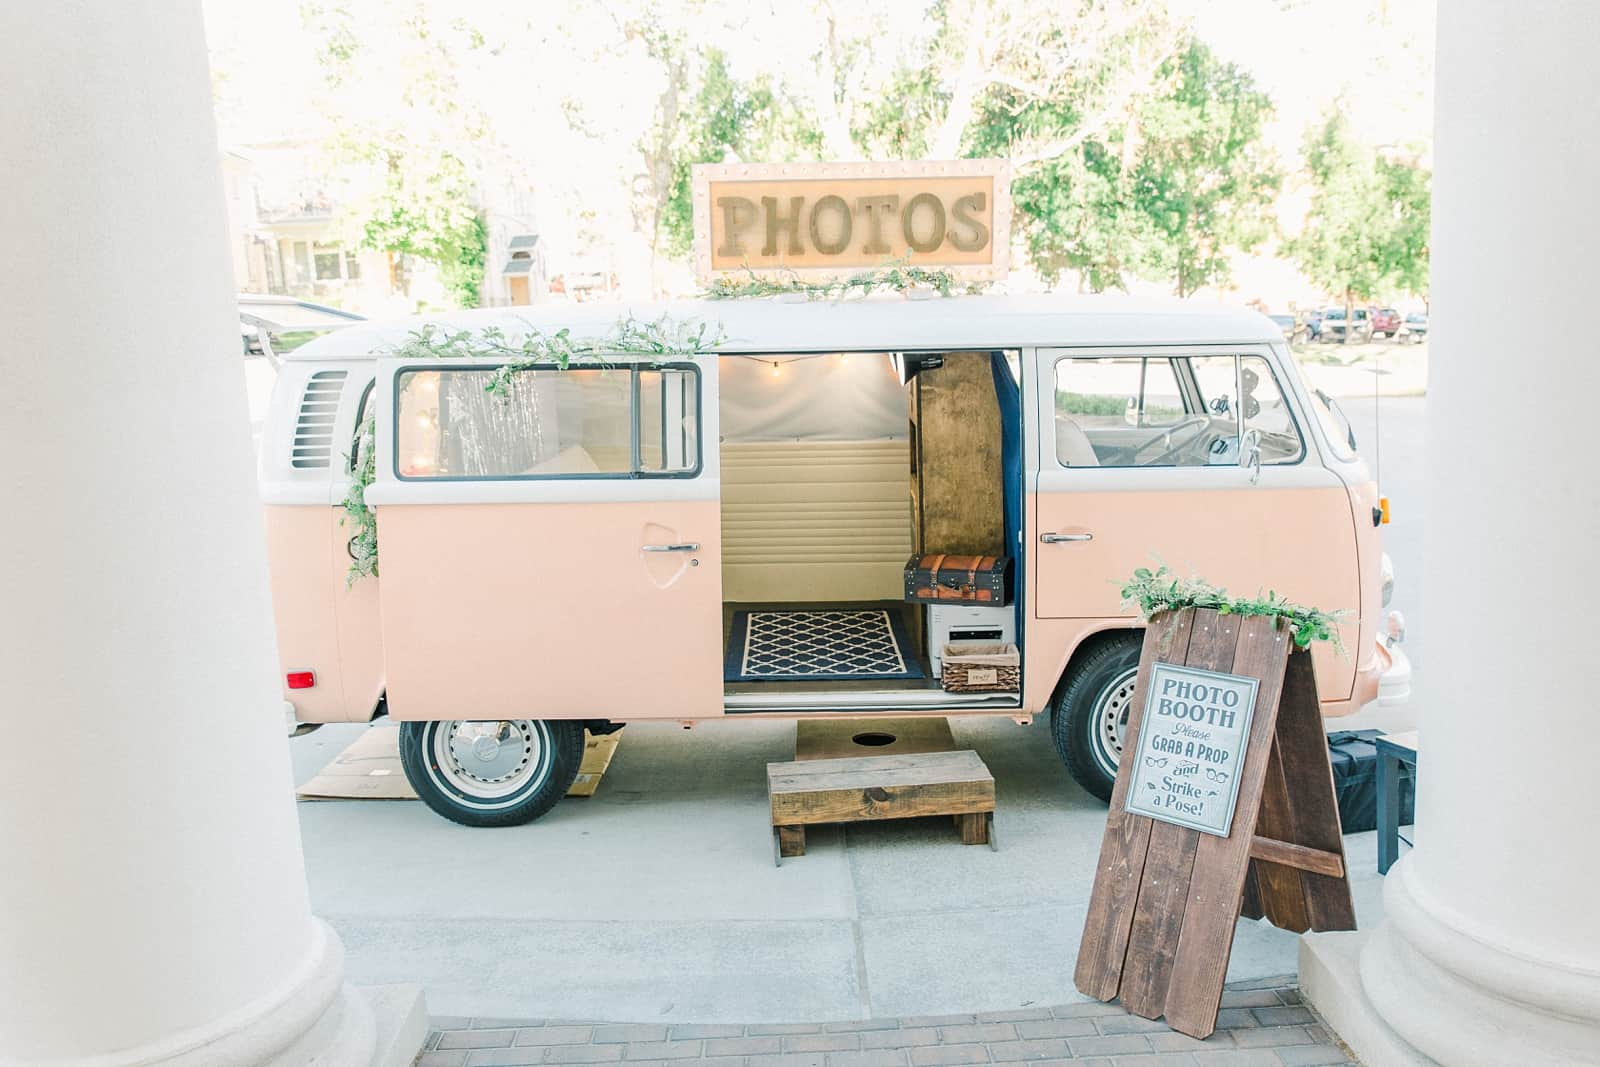 Thomas S. Monson Center Wedding, Salt Lake LDS Temple Wedding, Utah wedding photography, photo booth vintage pink VW bus